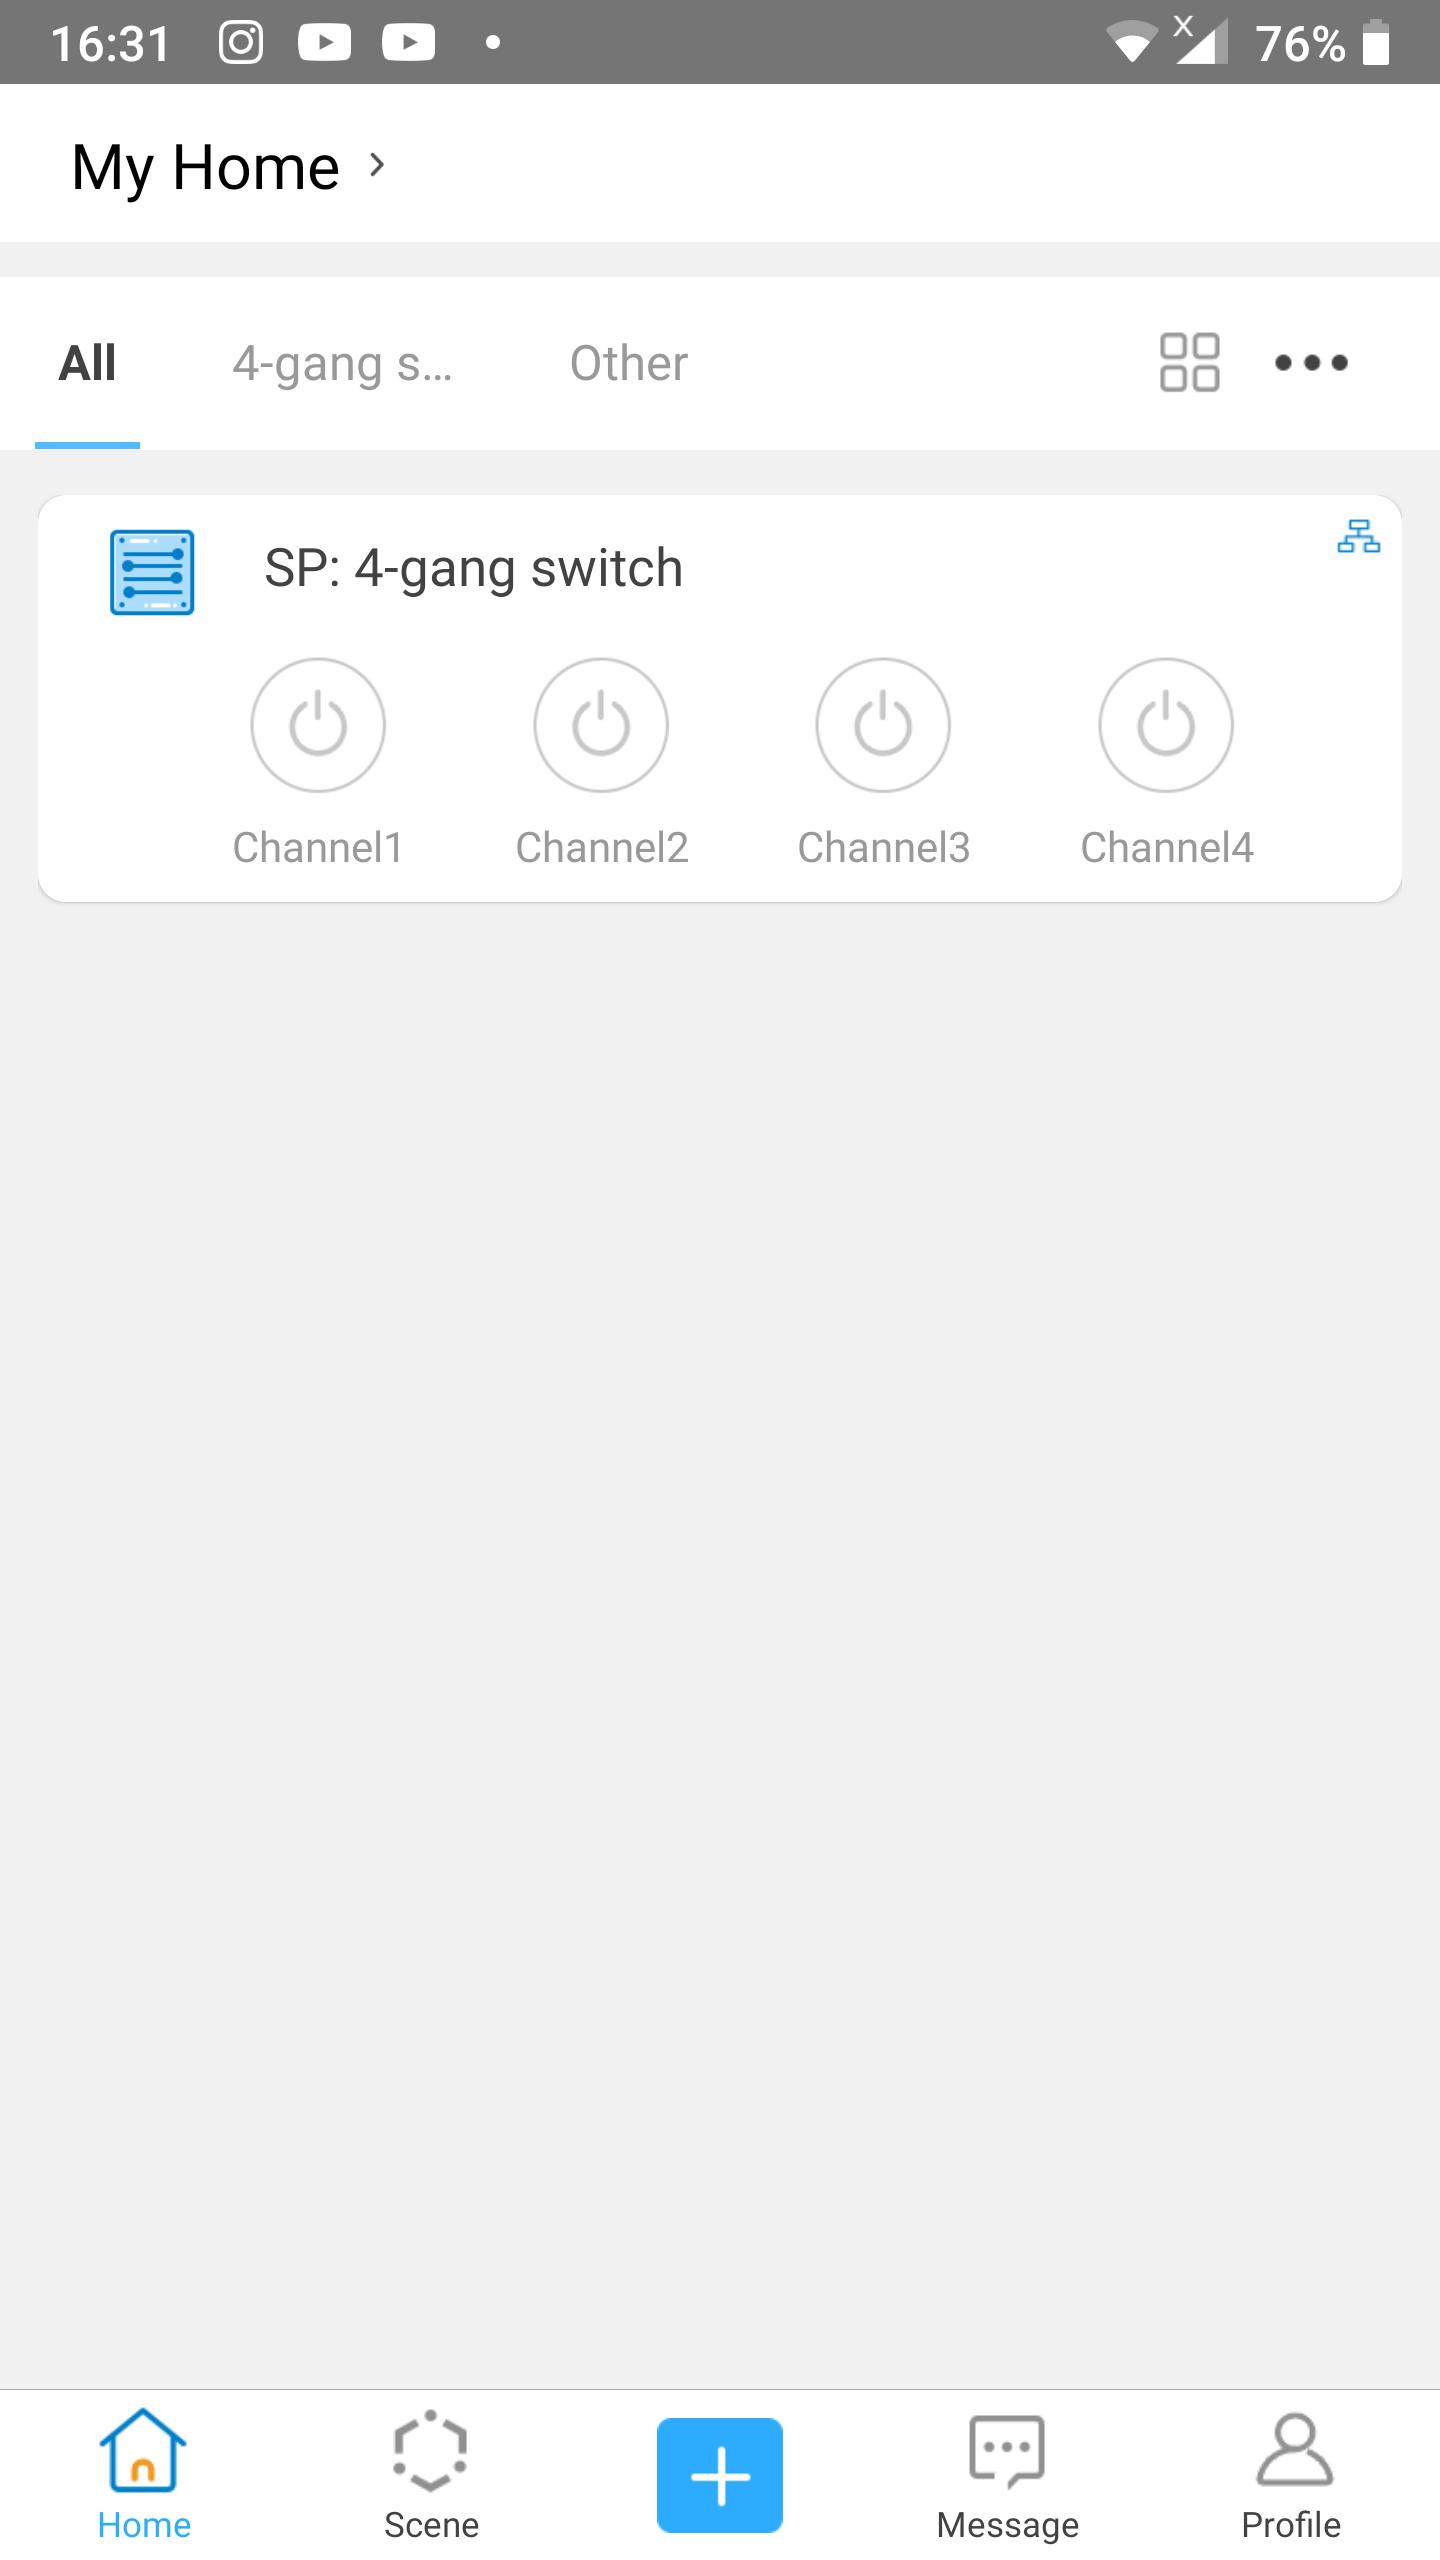 Link 2 scenes to schortcuts in eWeLink Keyboard: start screen